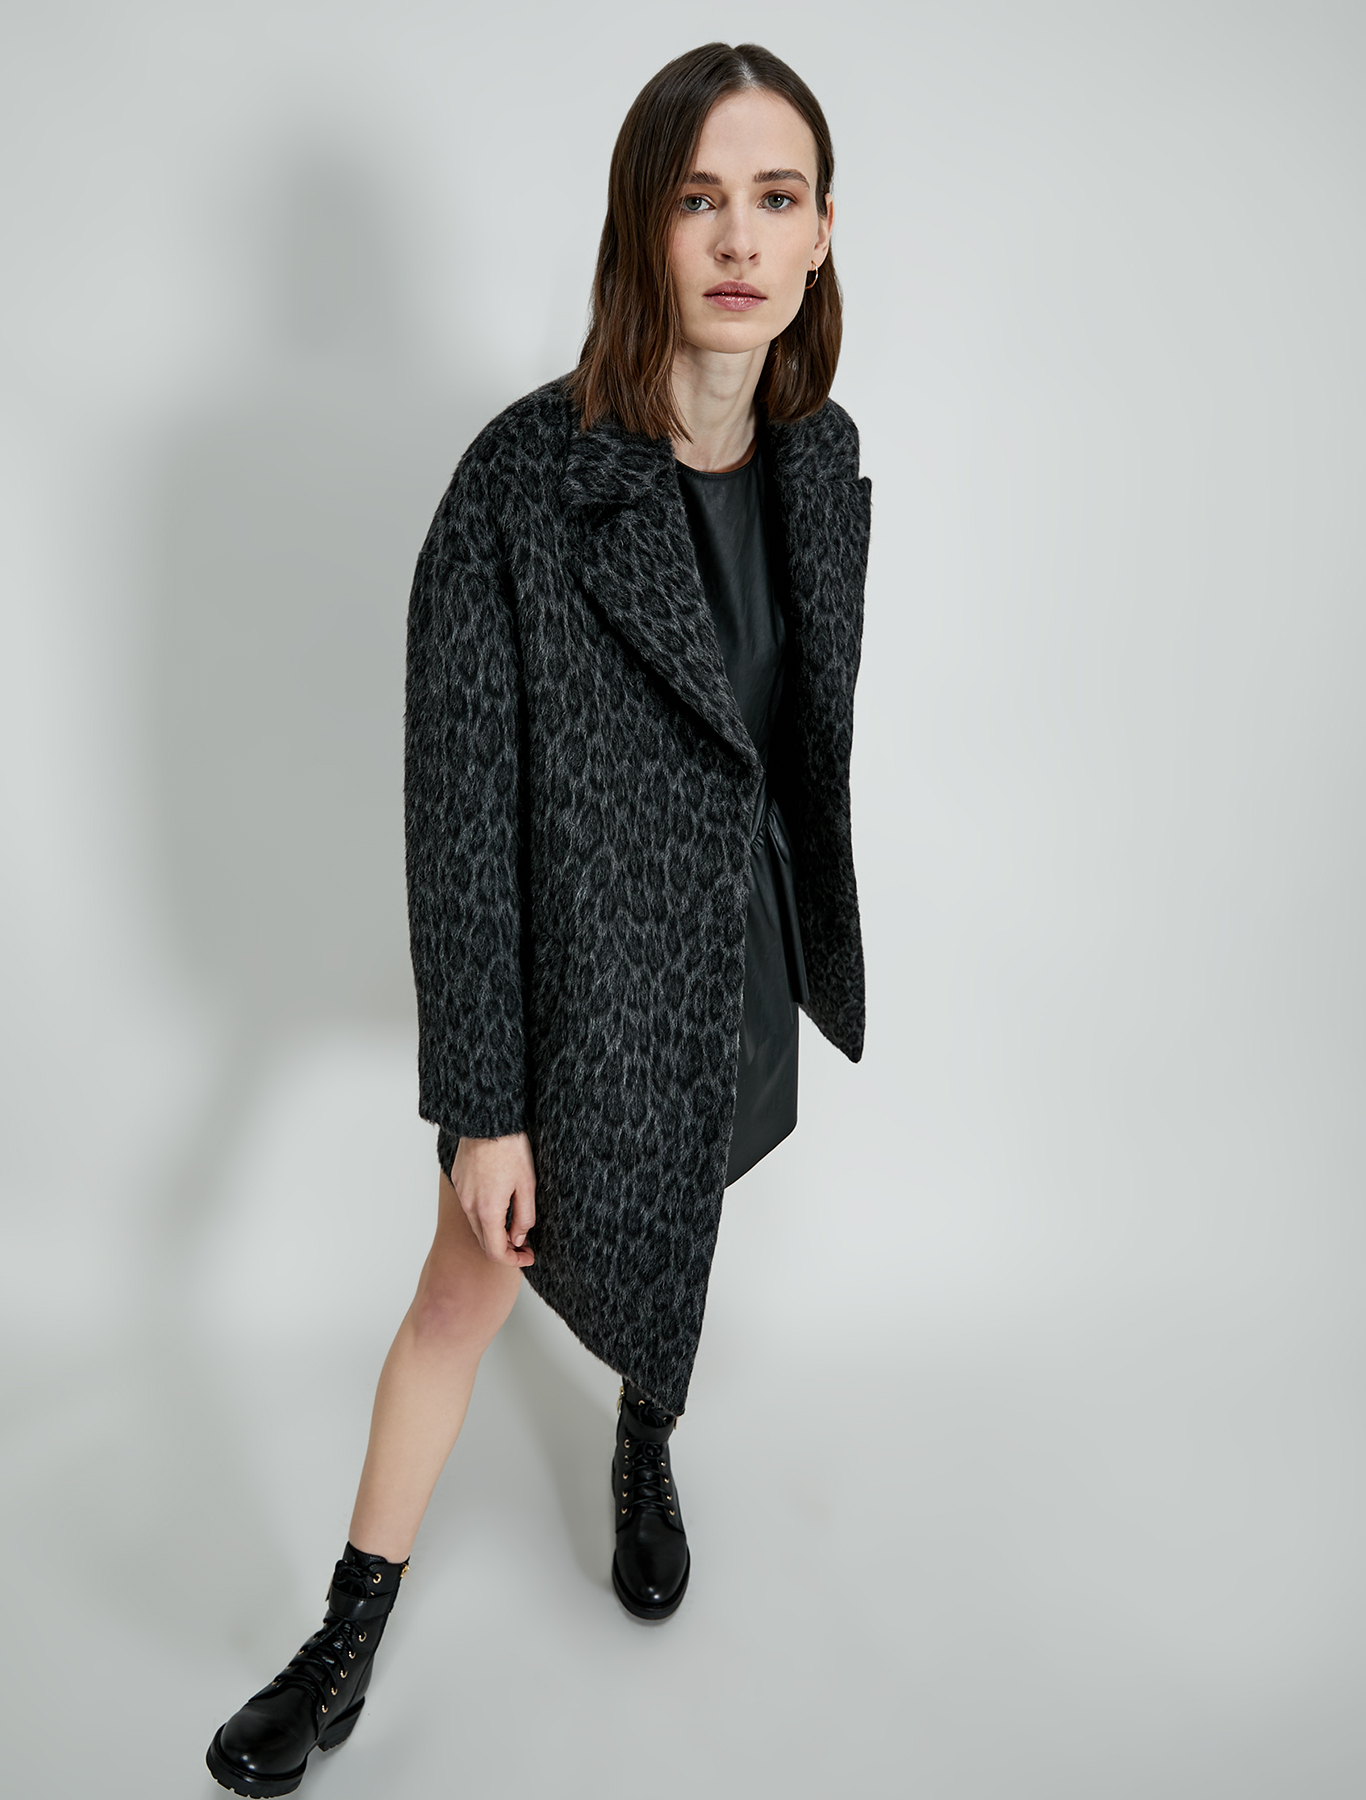 Coated jersey dress - black - pennyblack